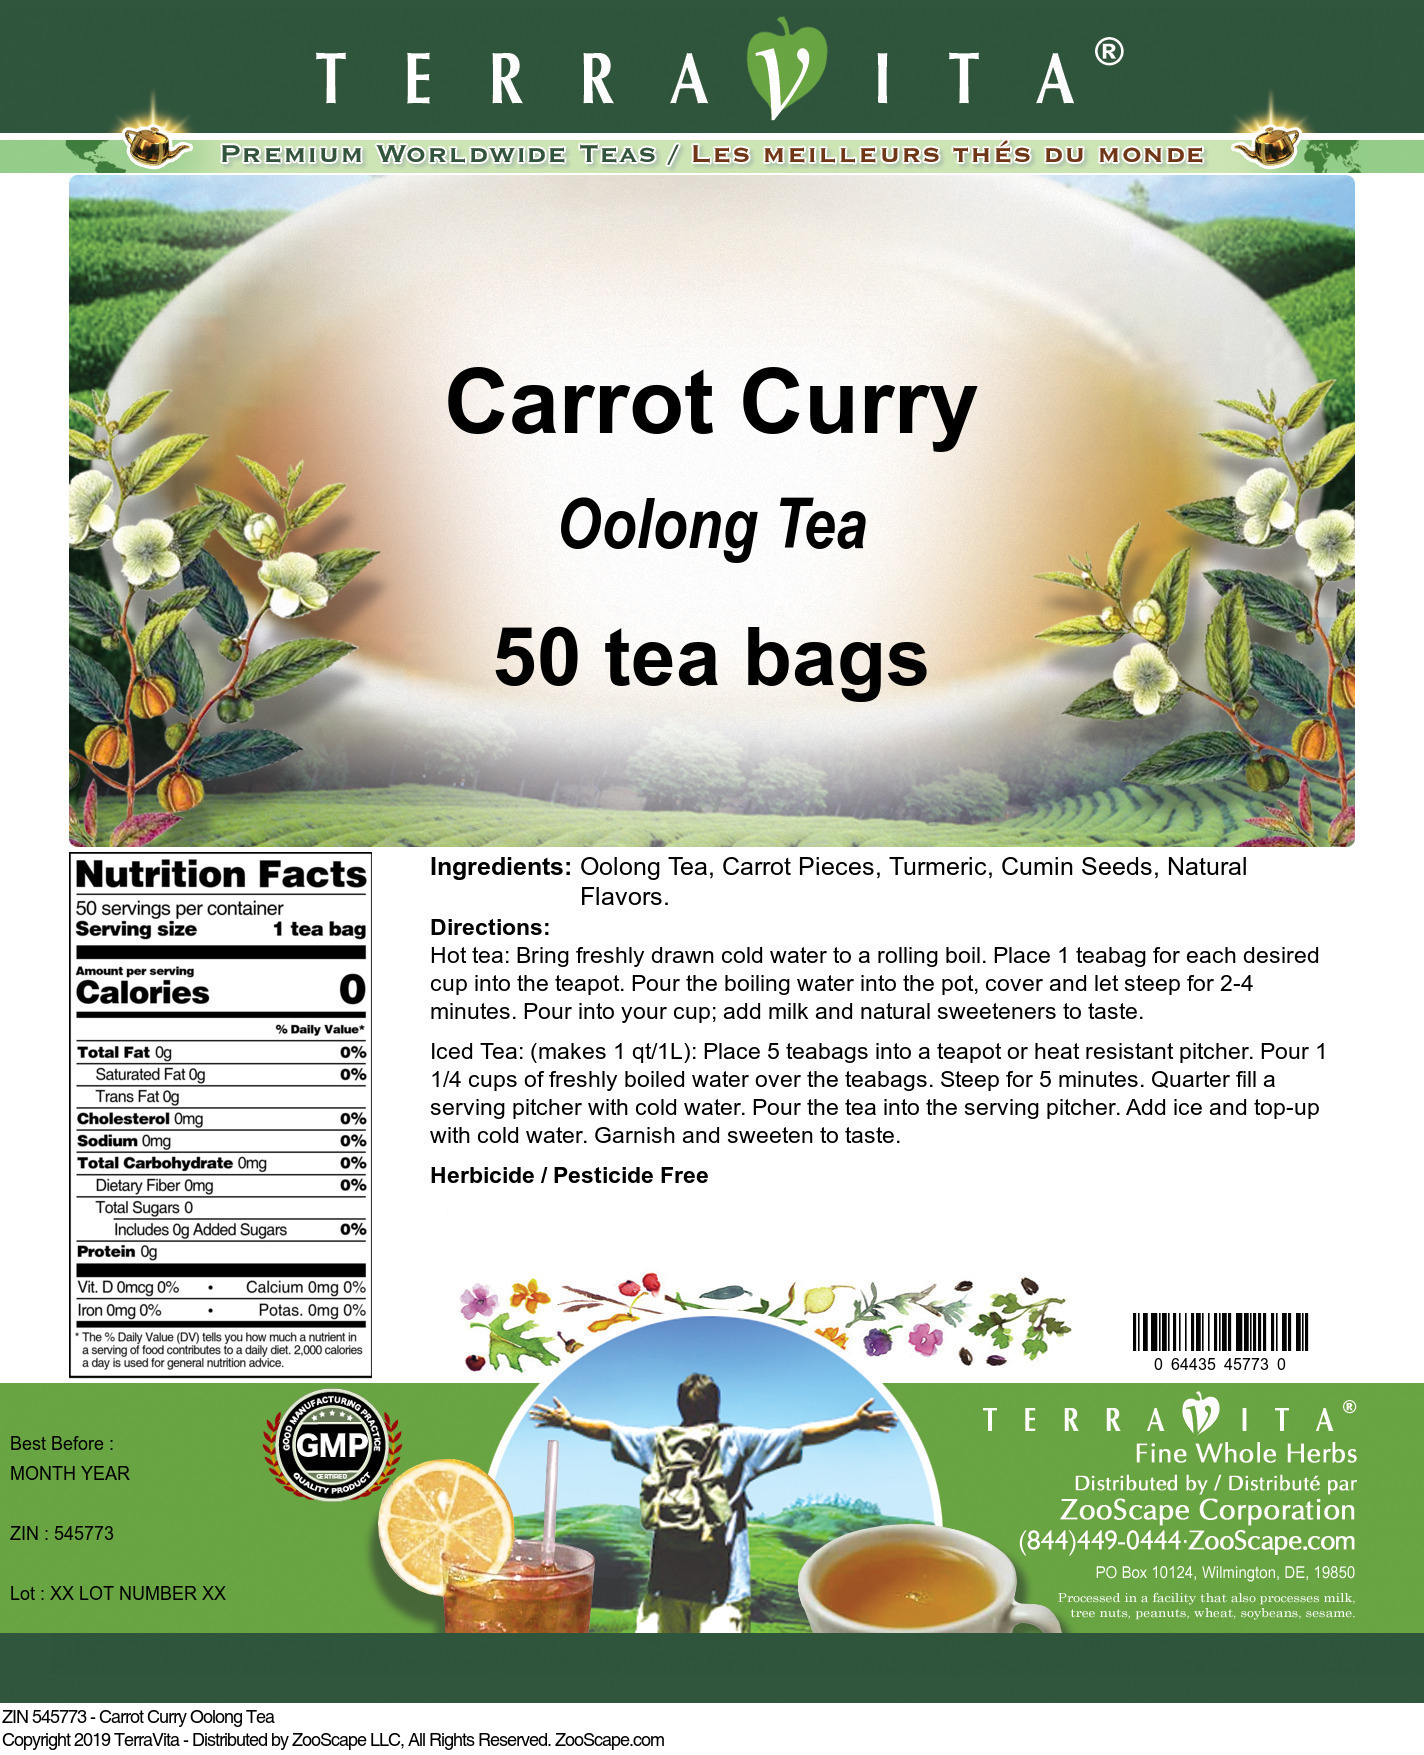 Carrot Curry Oolong Tea